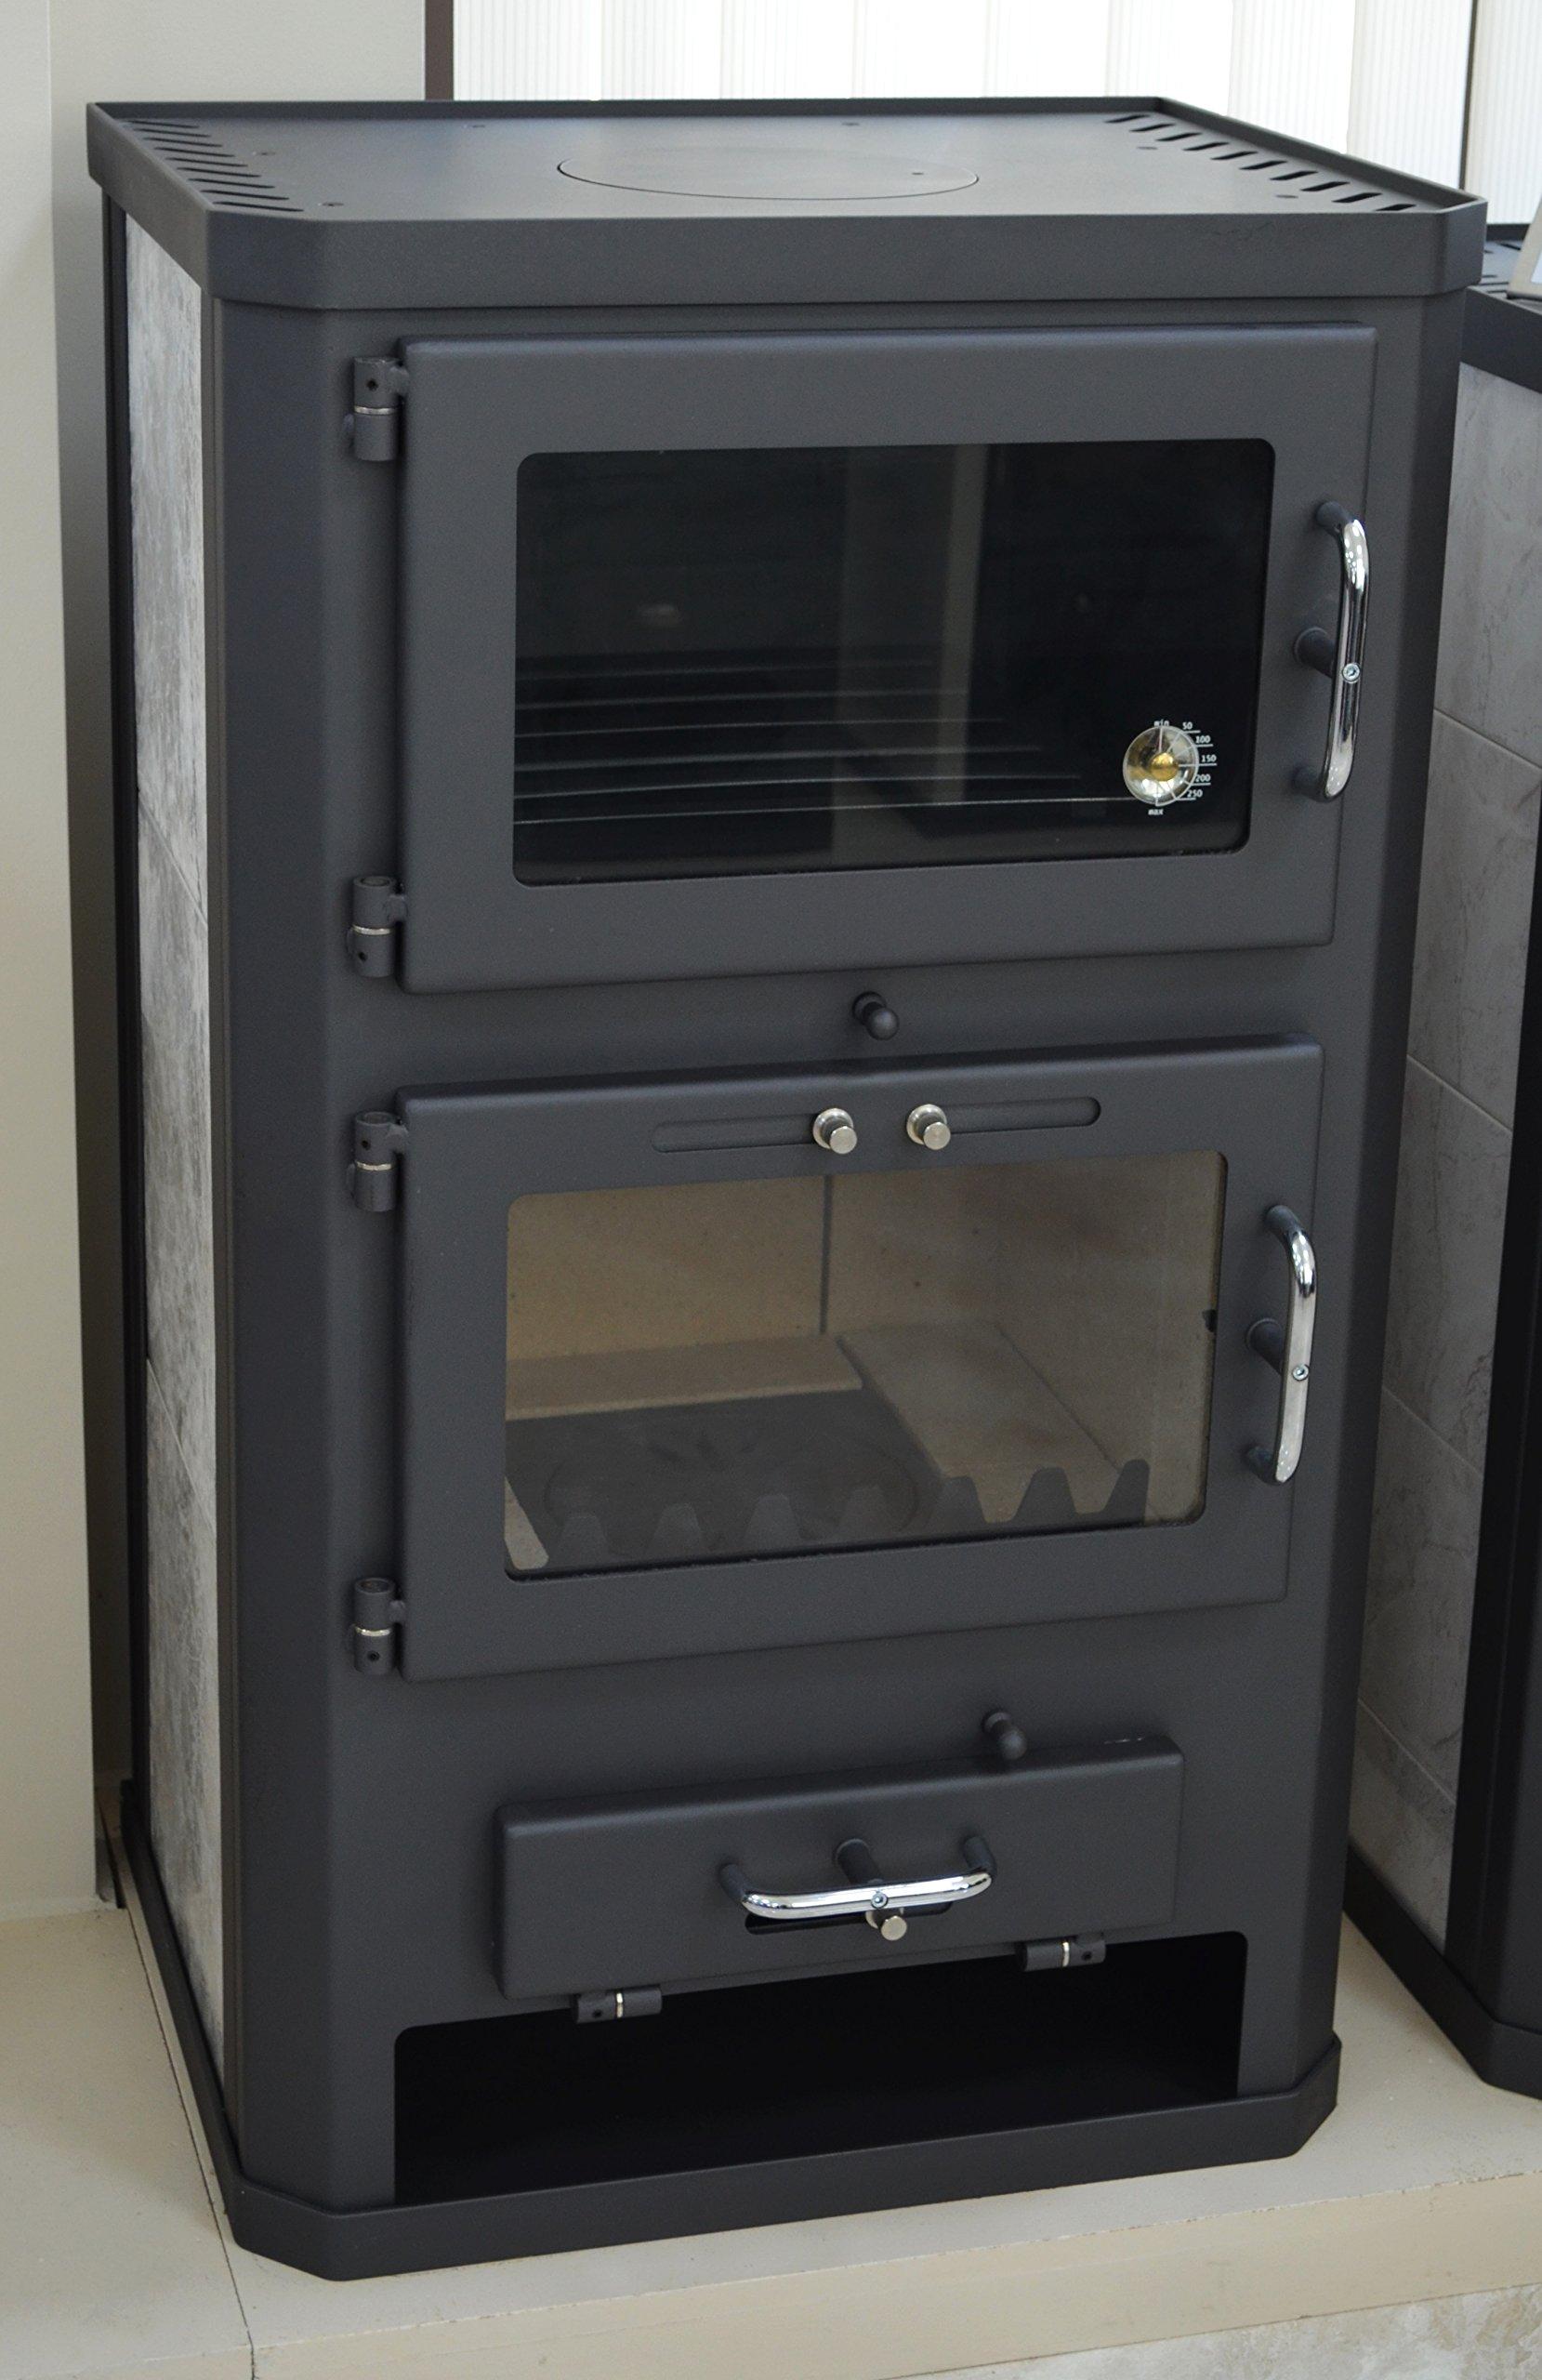 81q7t3Ur4YL - Estufa de leña para estufa, estufa, cocina, combustible, quemador de leña, 12/17 kW, BImSchV 2